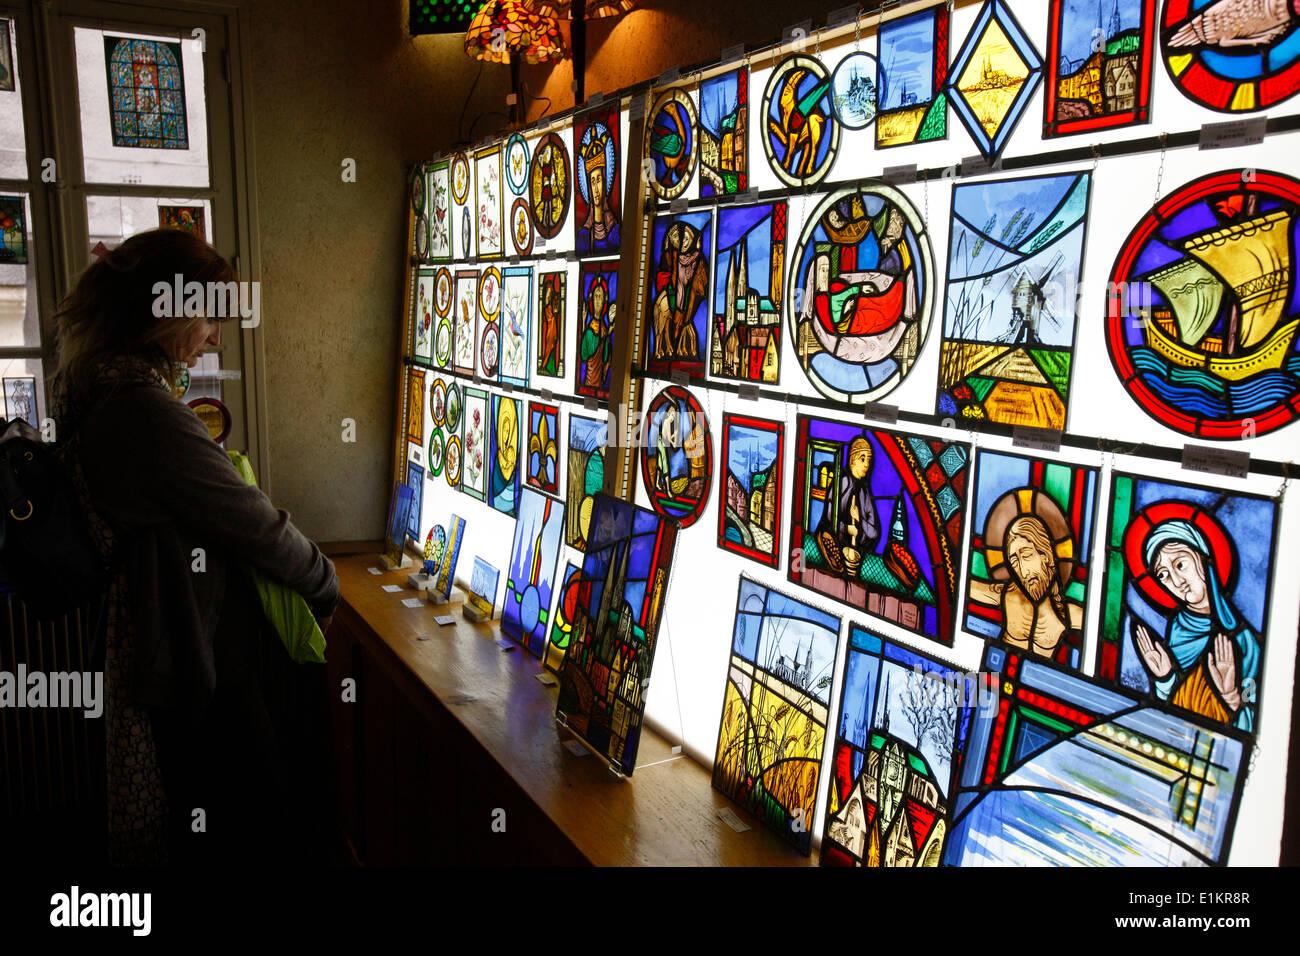 Religious shop. - Stock Image